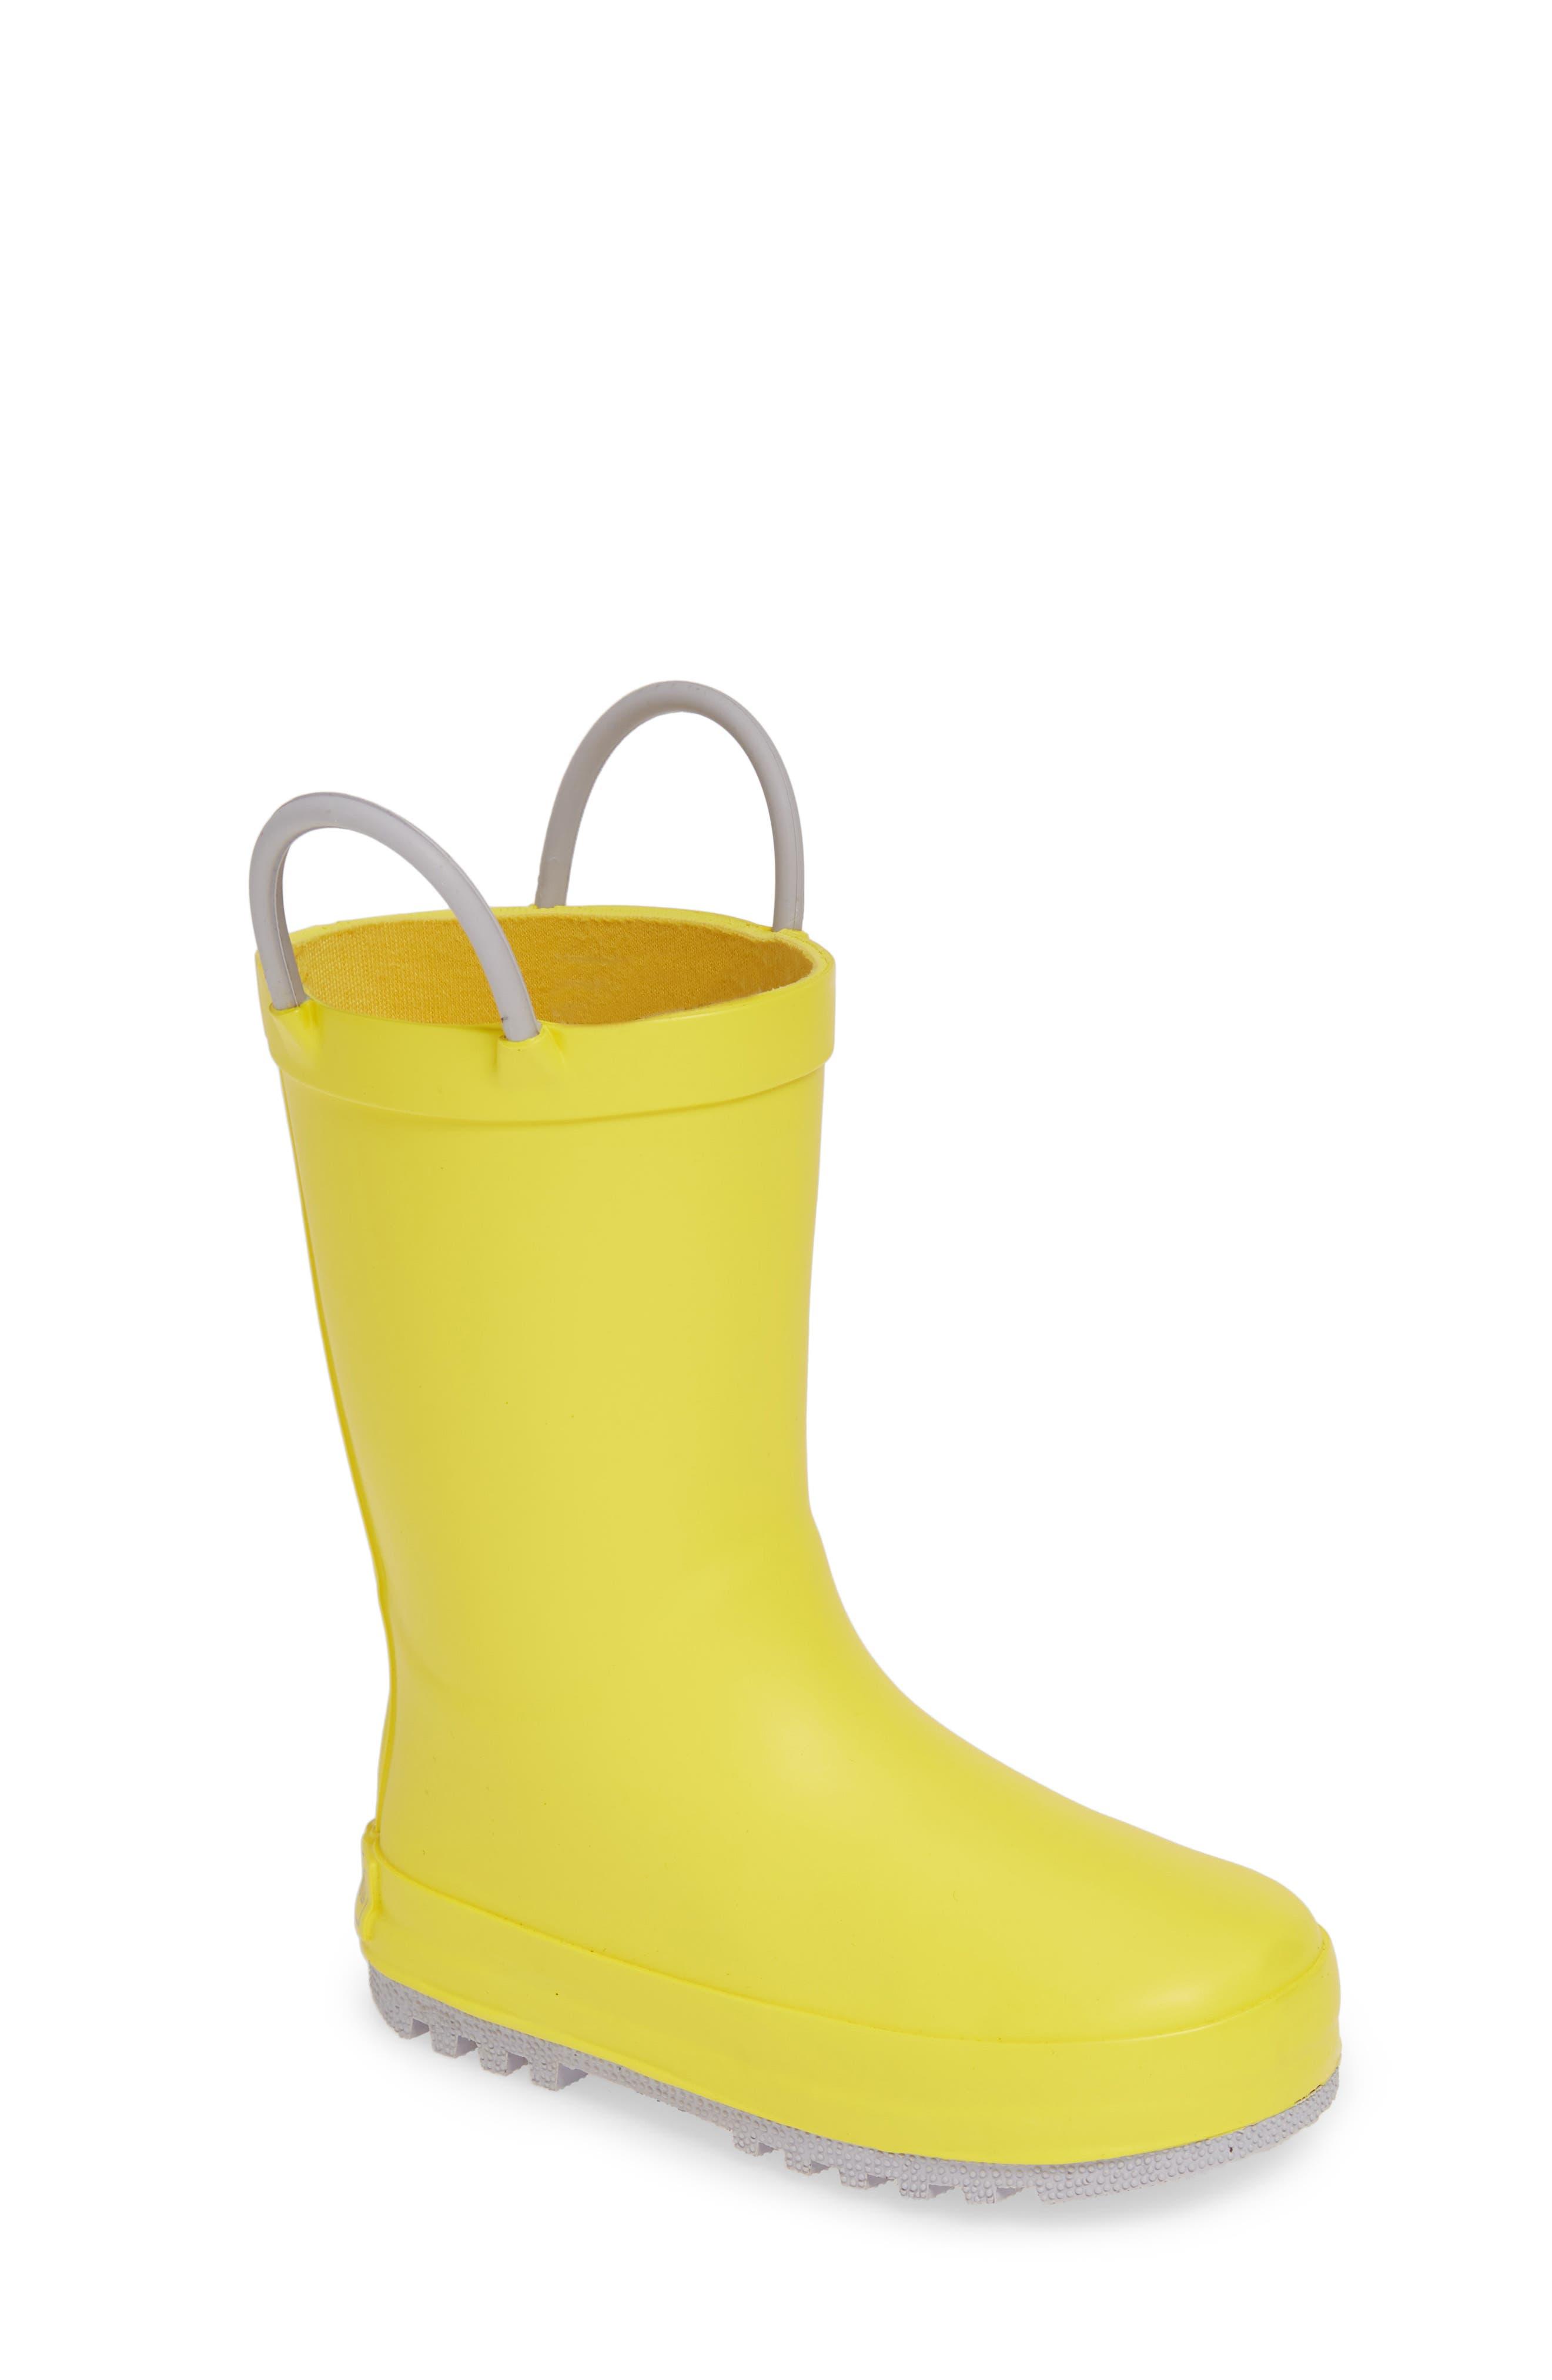 TUCKER + TATE,                             Puddle Rain Boot,                             Main thumbnail 1, color,                             YELLOW/ GREY RUBBER